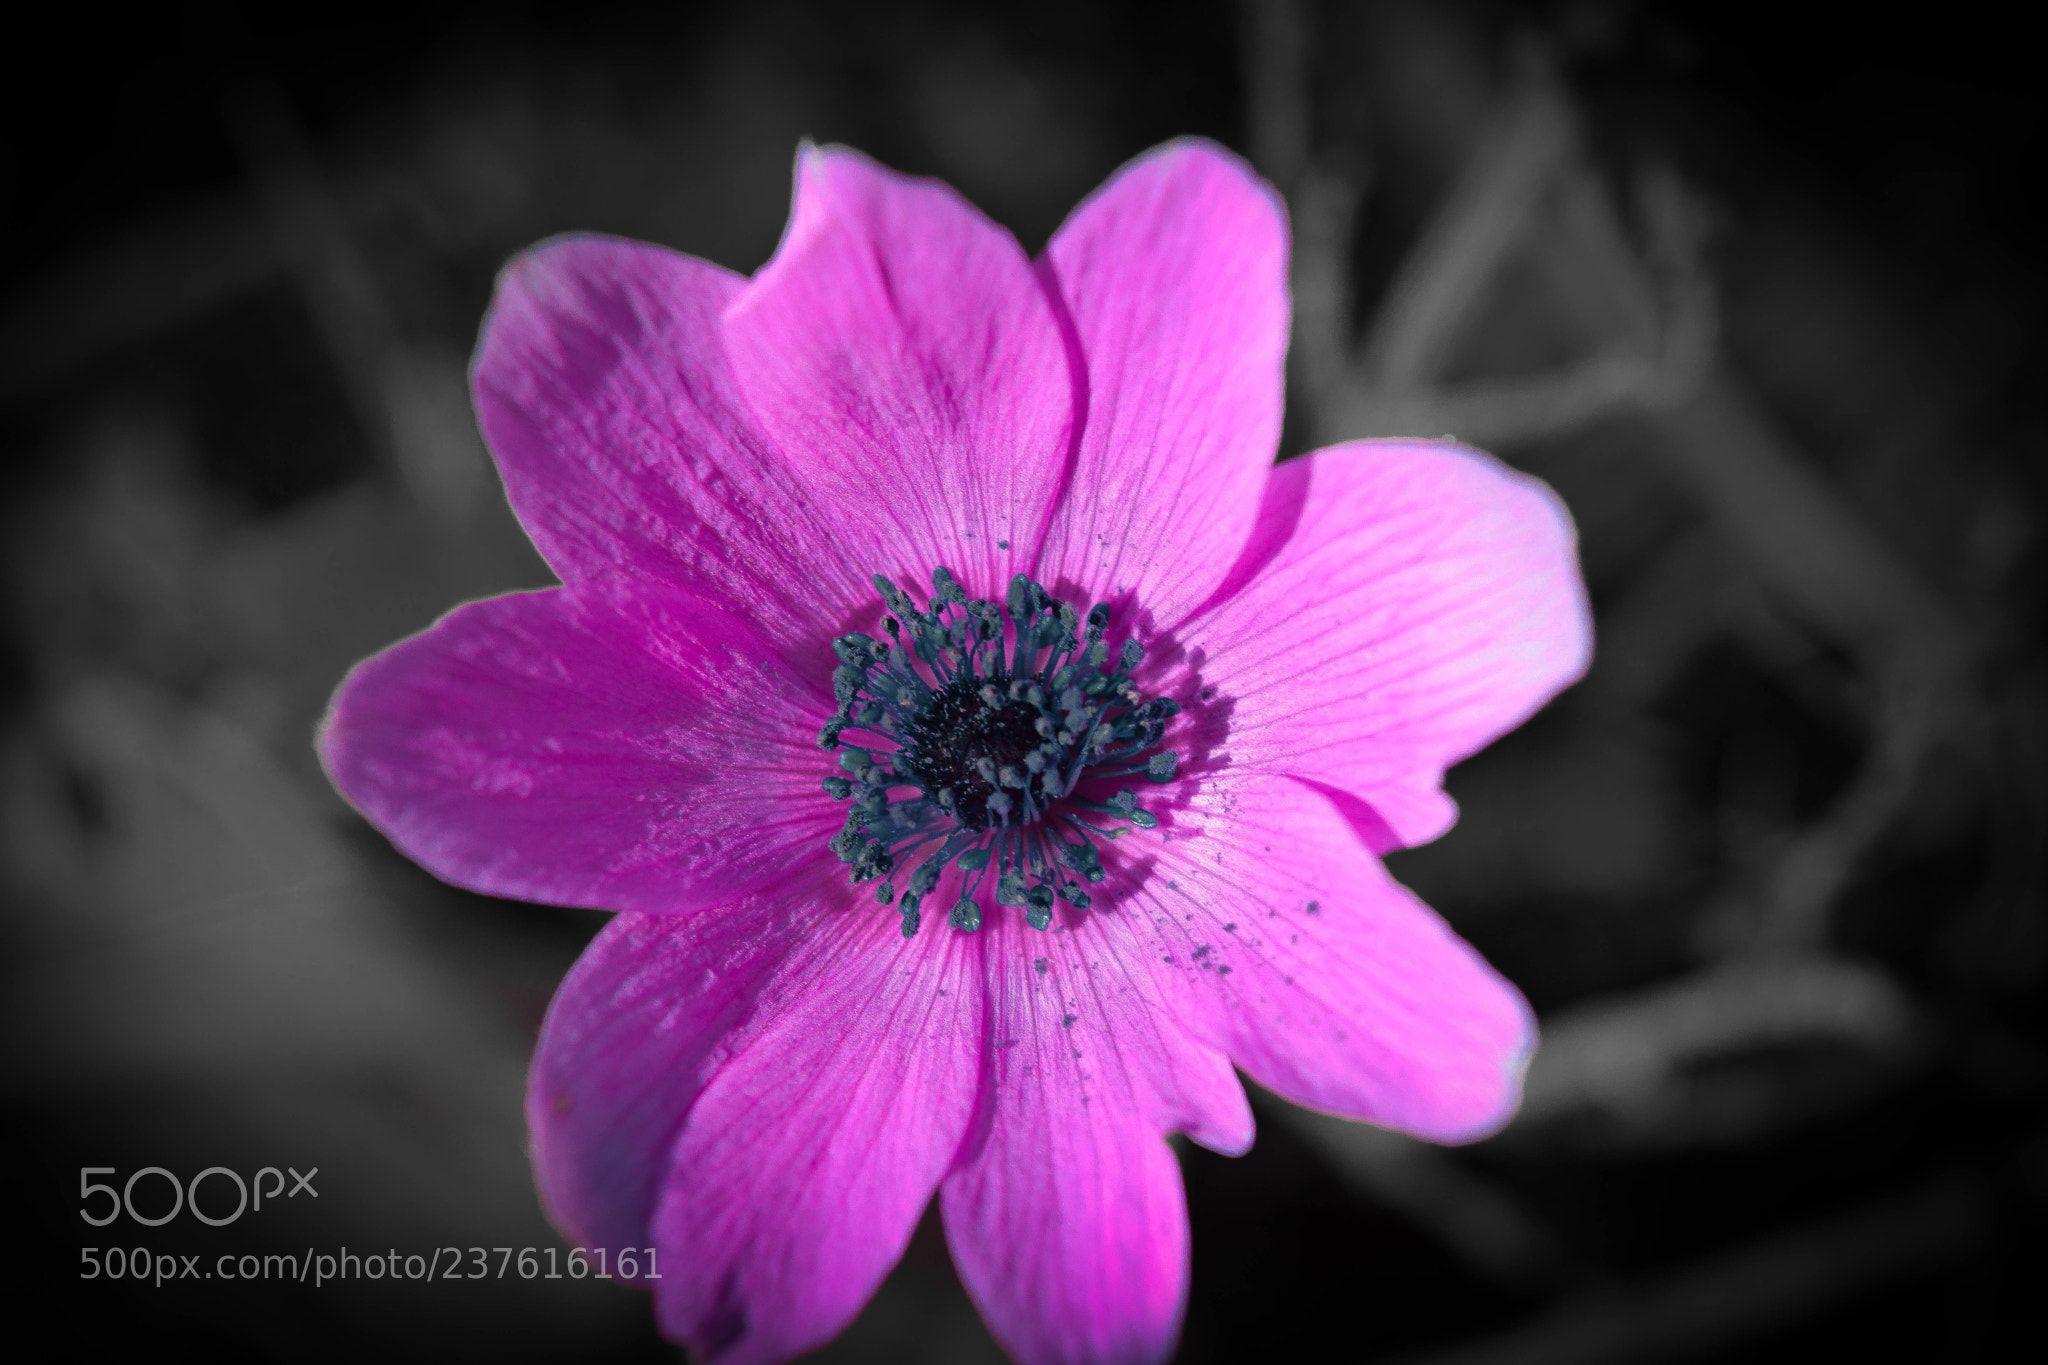 Pink Black Flower Chris Manos Corfu Greece Nikon D3300 Macro